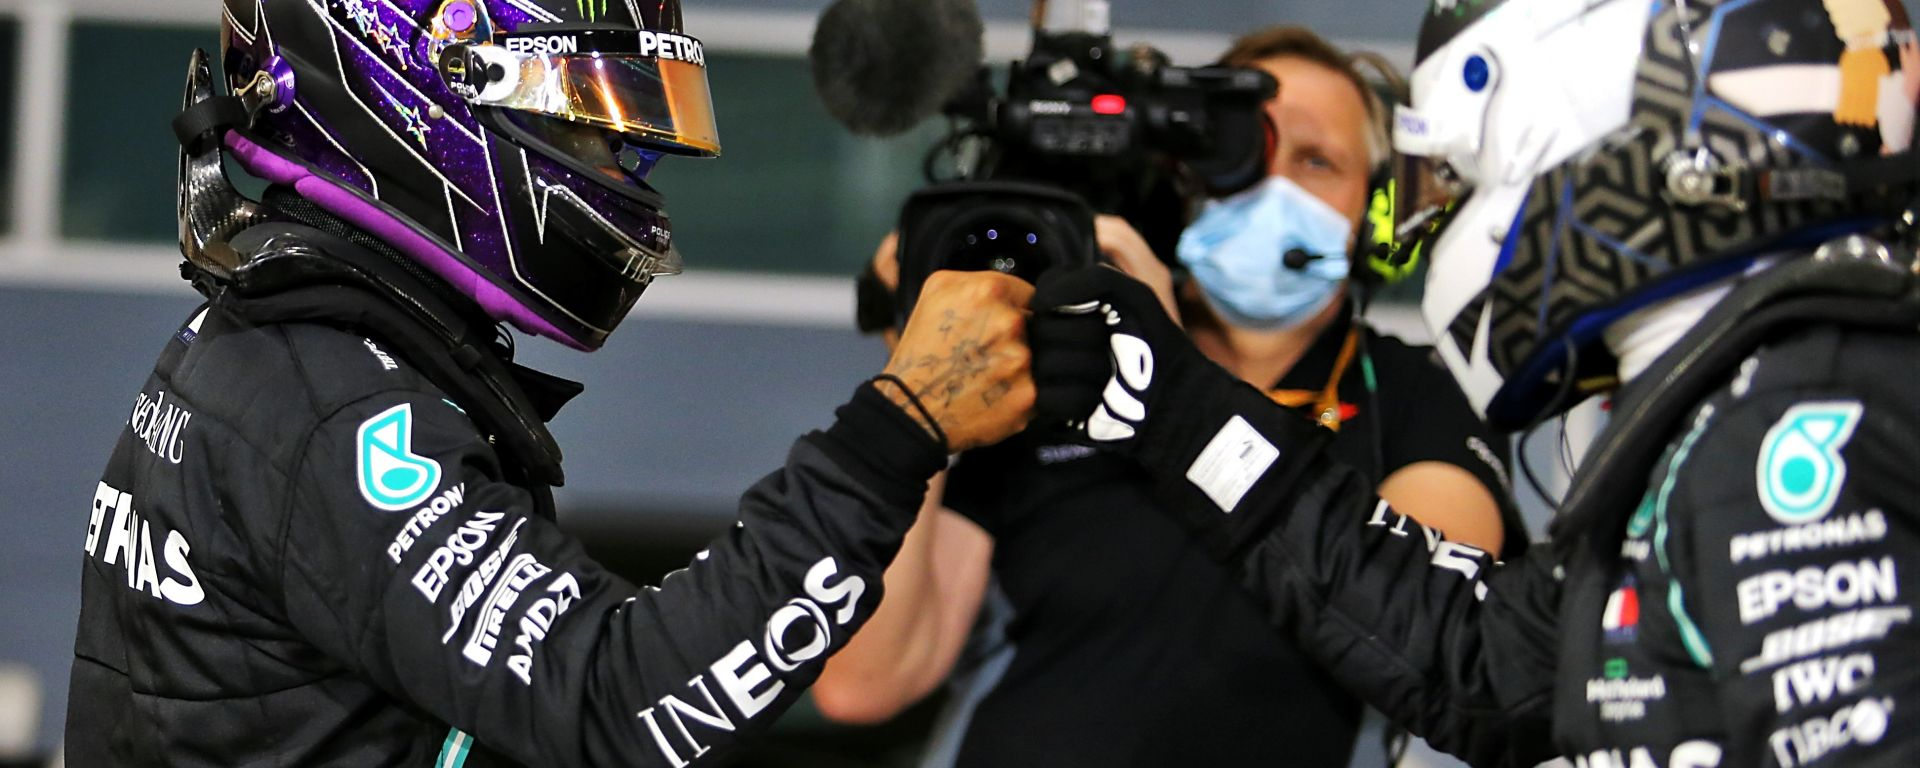 F1 GP Bahrain 2020, Sakhir: Lewis Hamilton e Valtteri Bottas (Mercedes) festeggiano la prima fila